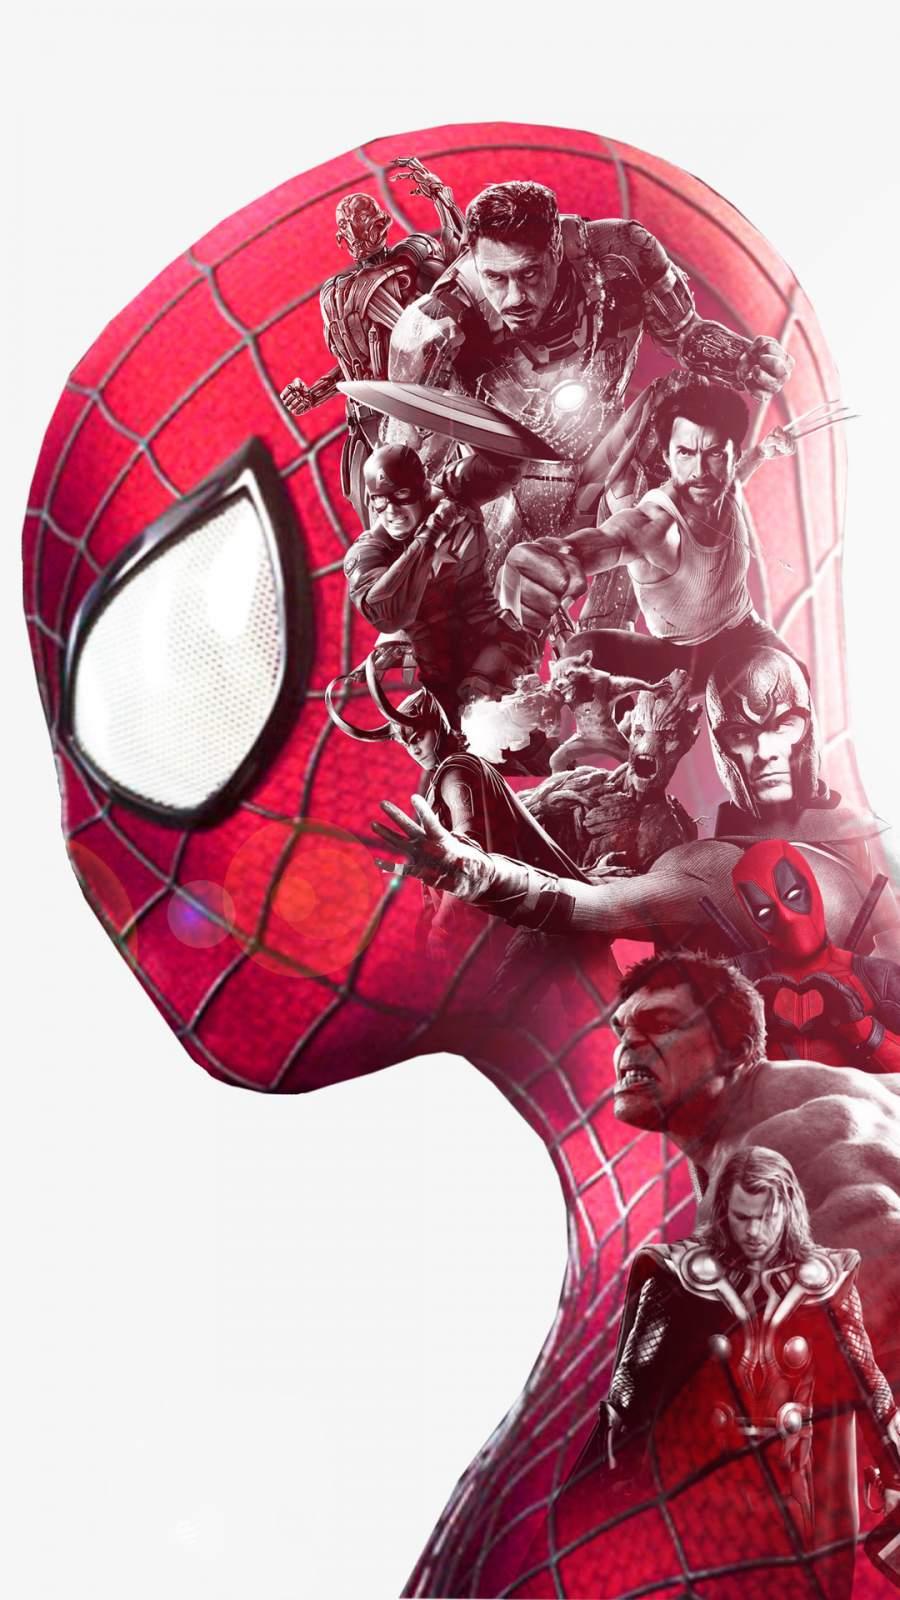 Spiderman Superheroes Art iPhone Wallpaper